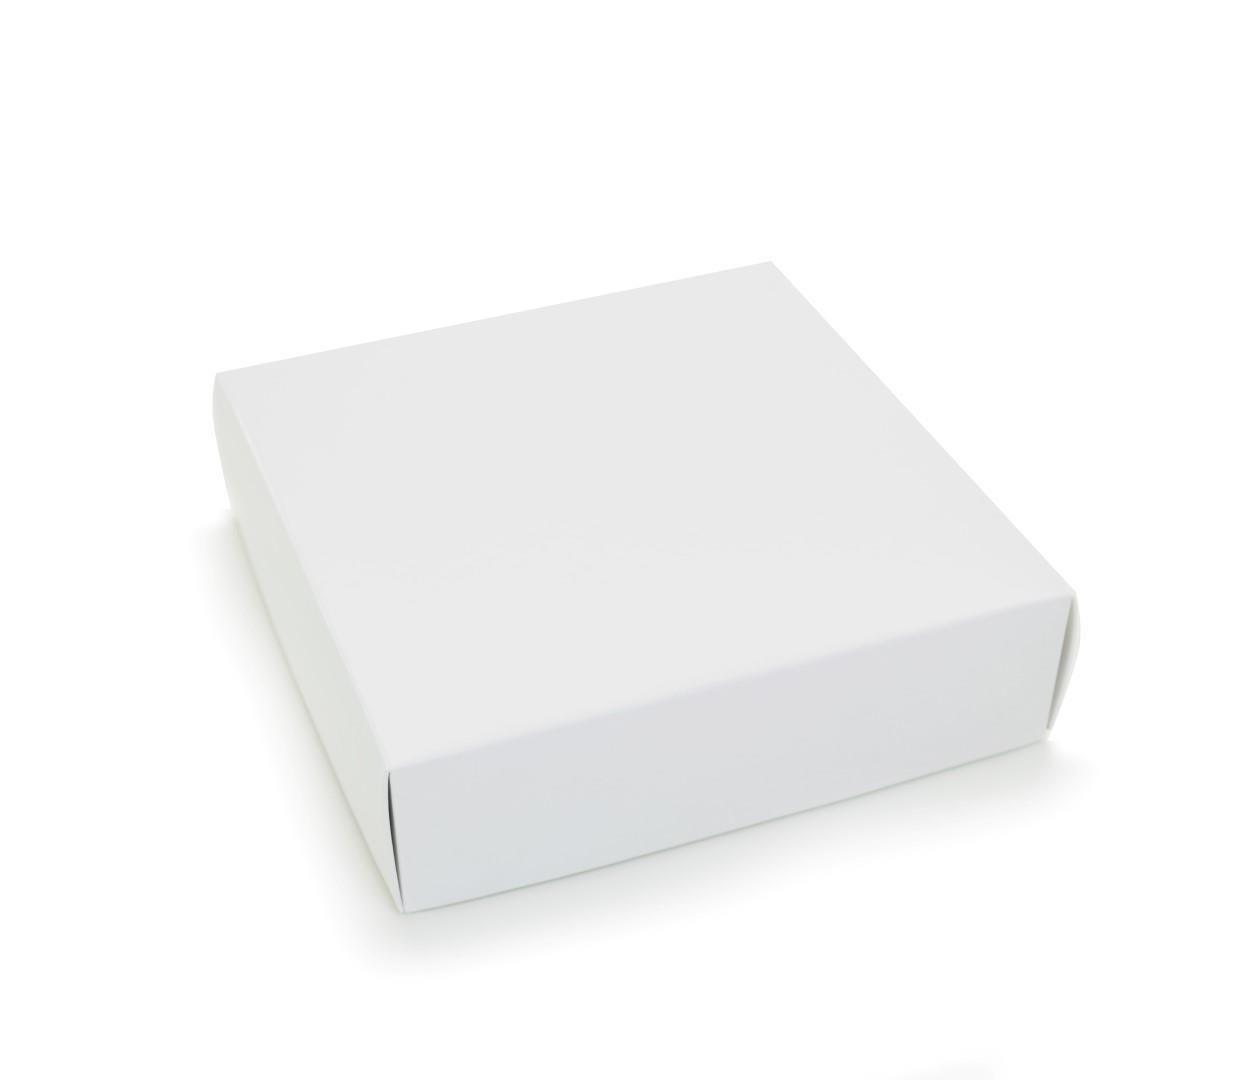 Ref 004 Branca - Caixa c/ tampa papel - 17,5x17,5x5 cm - c/ 10 unidades